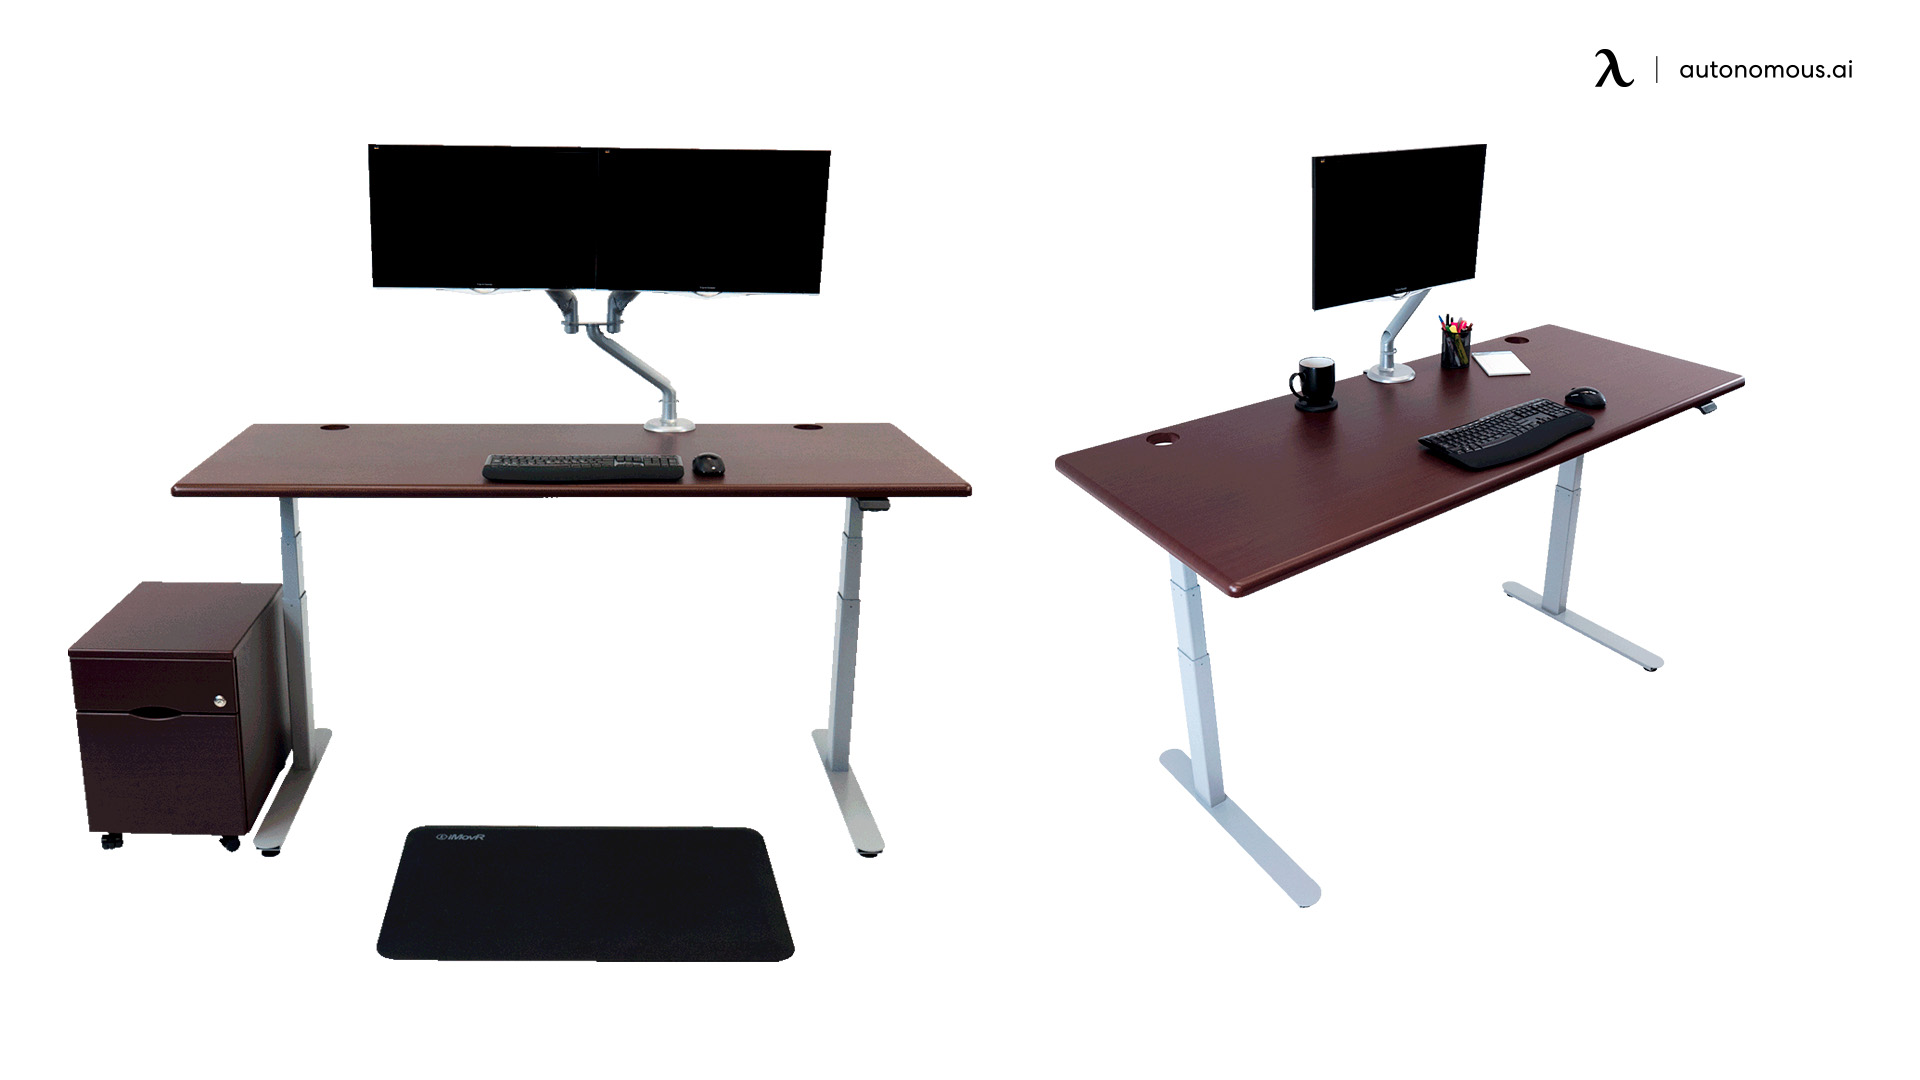 iMovR Cascade Corner Standing Desk